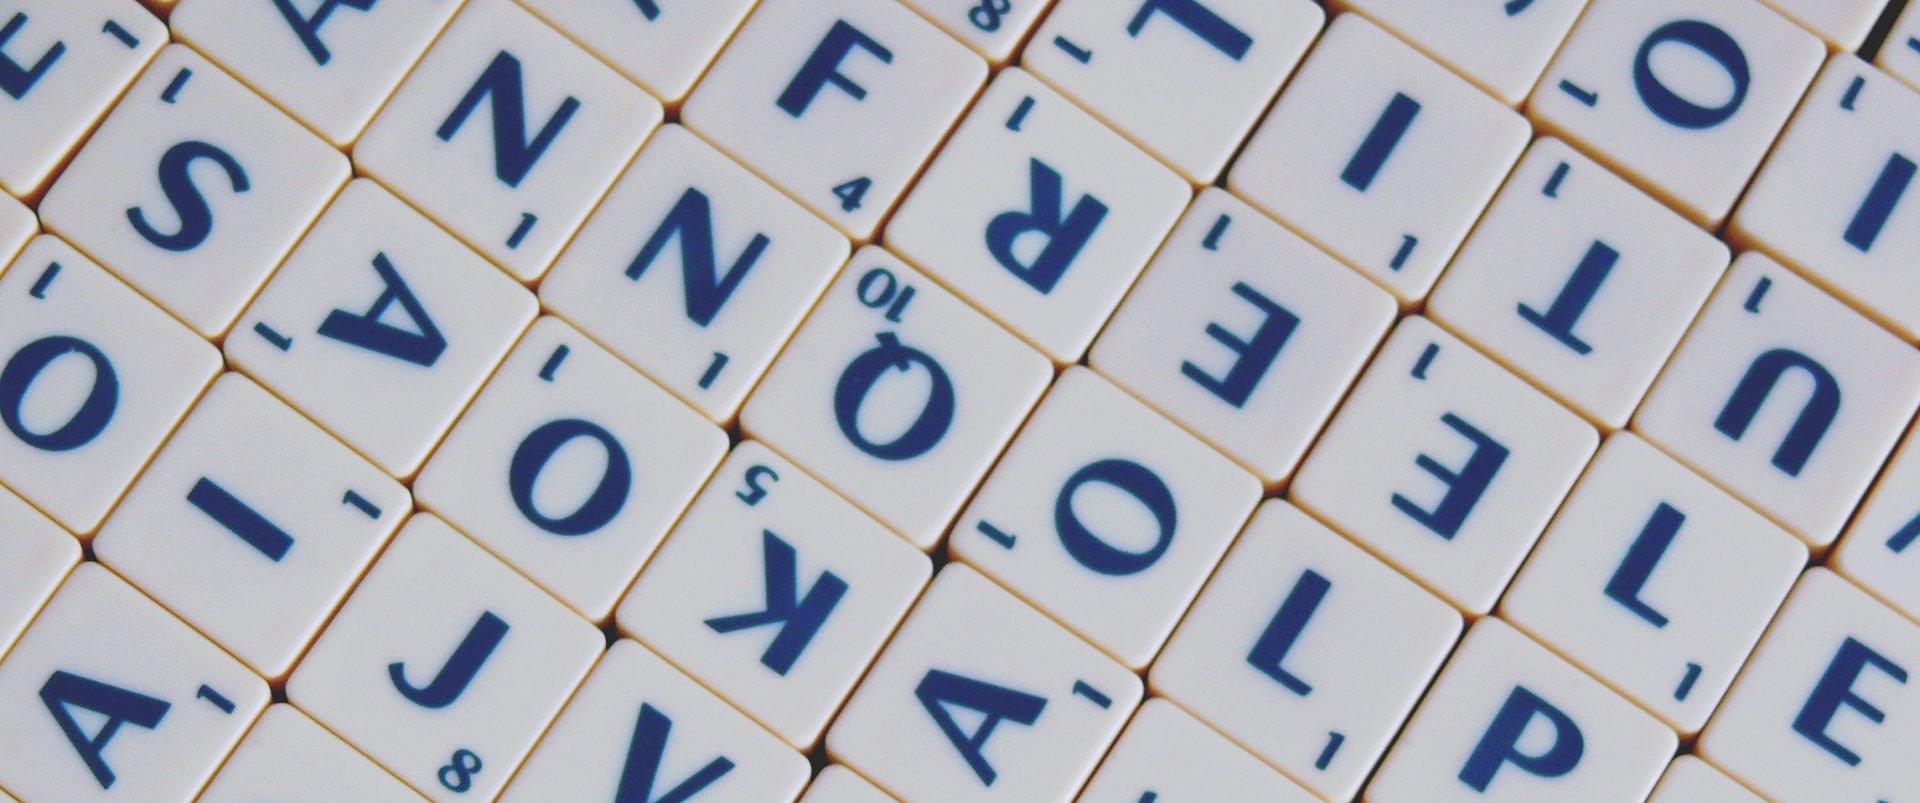 Scrabble Źródło: Scrabble, licencja: CC 0.